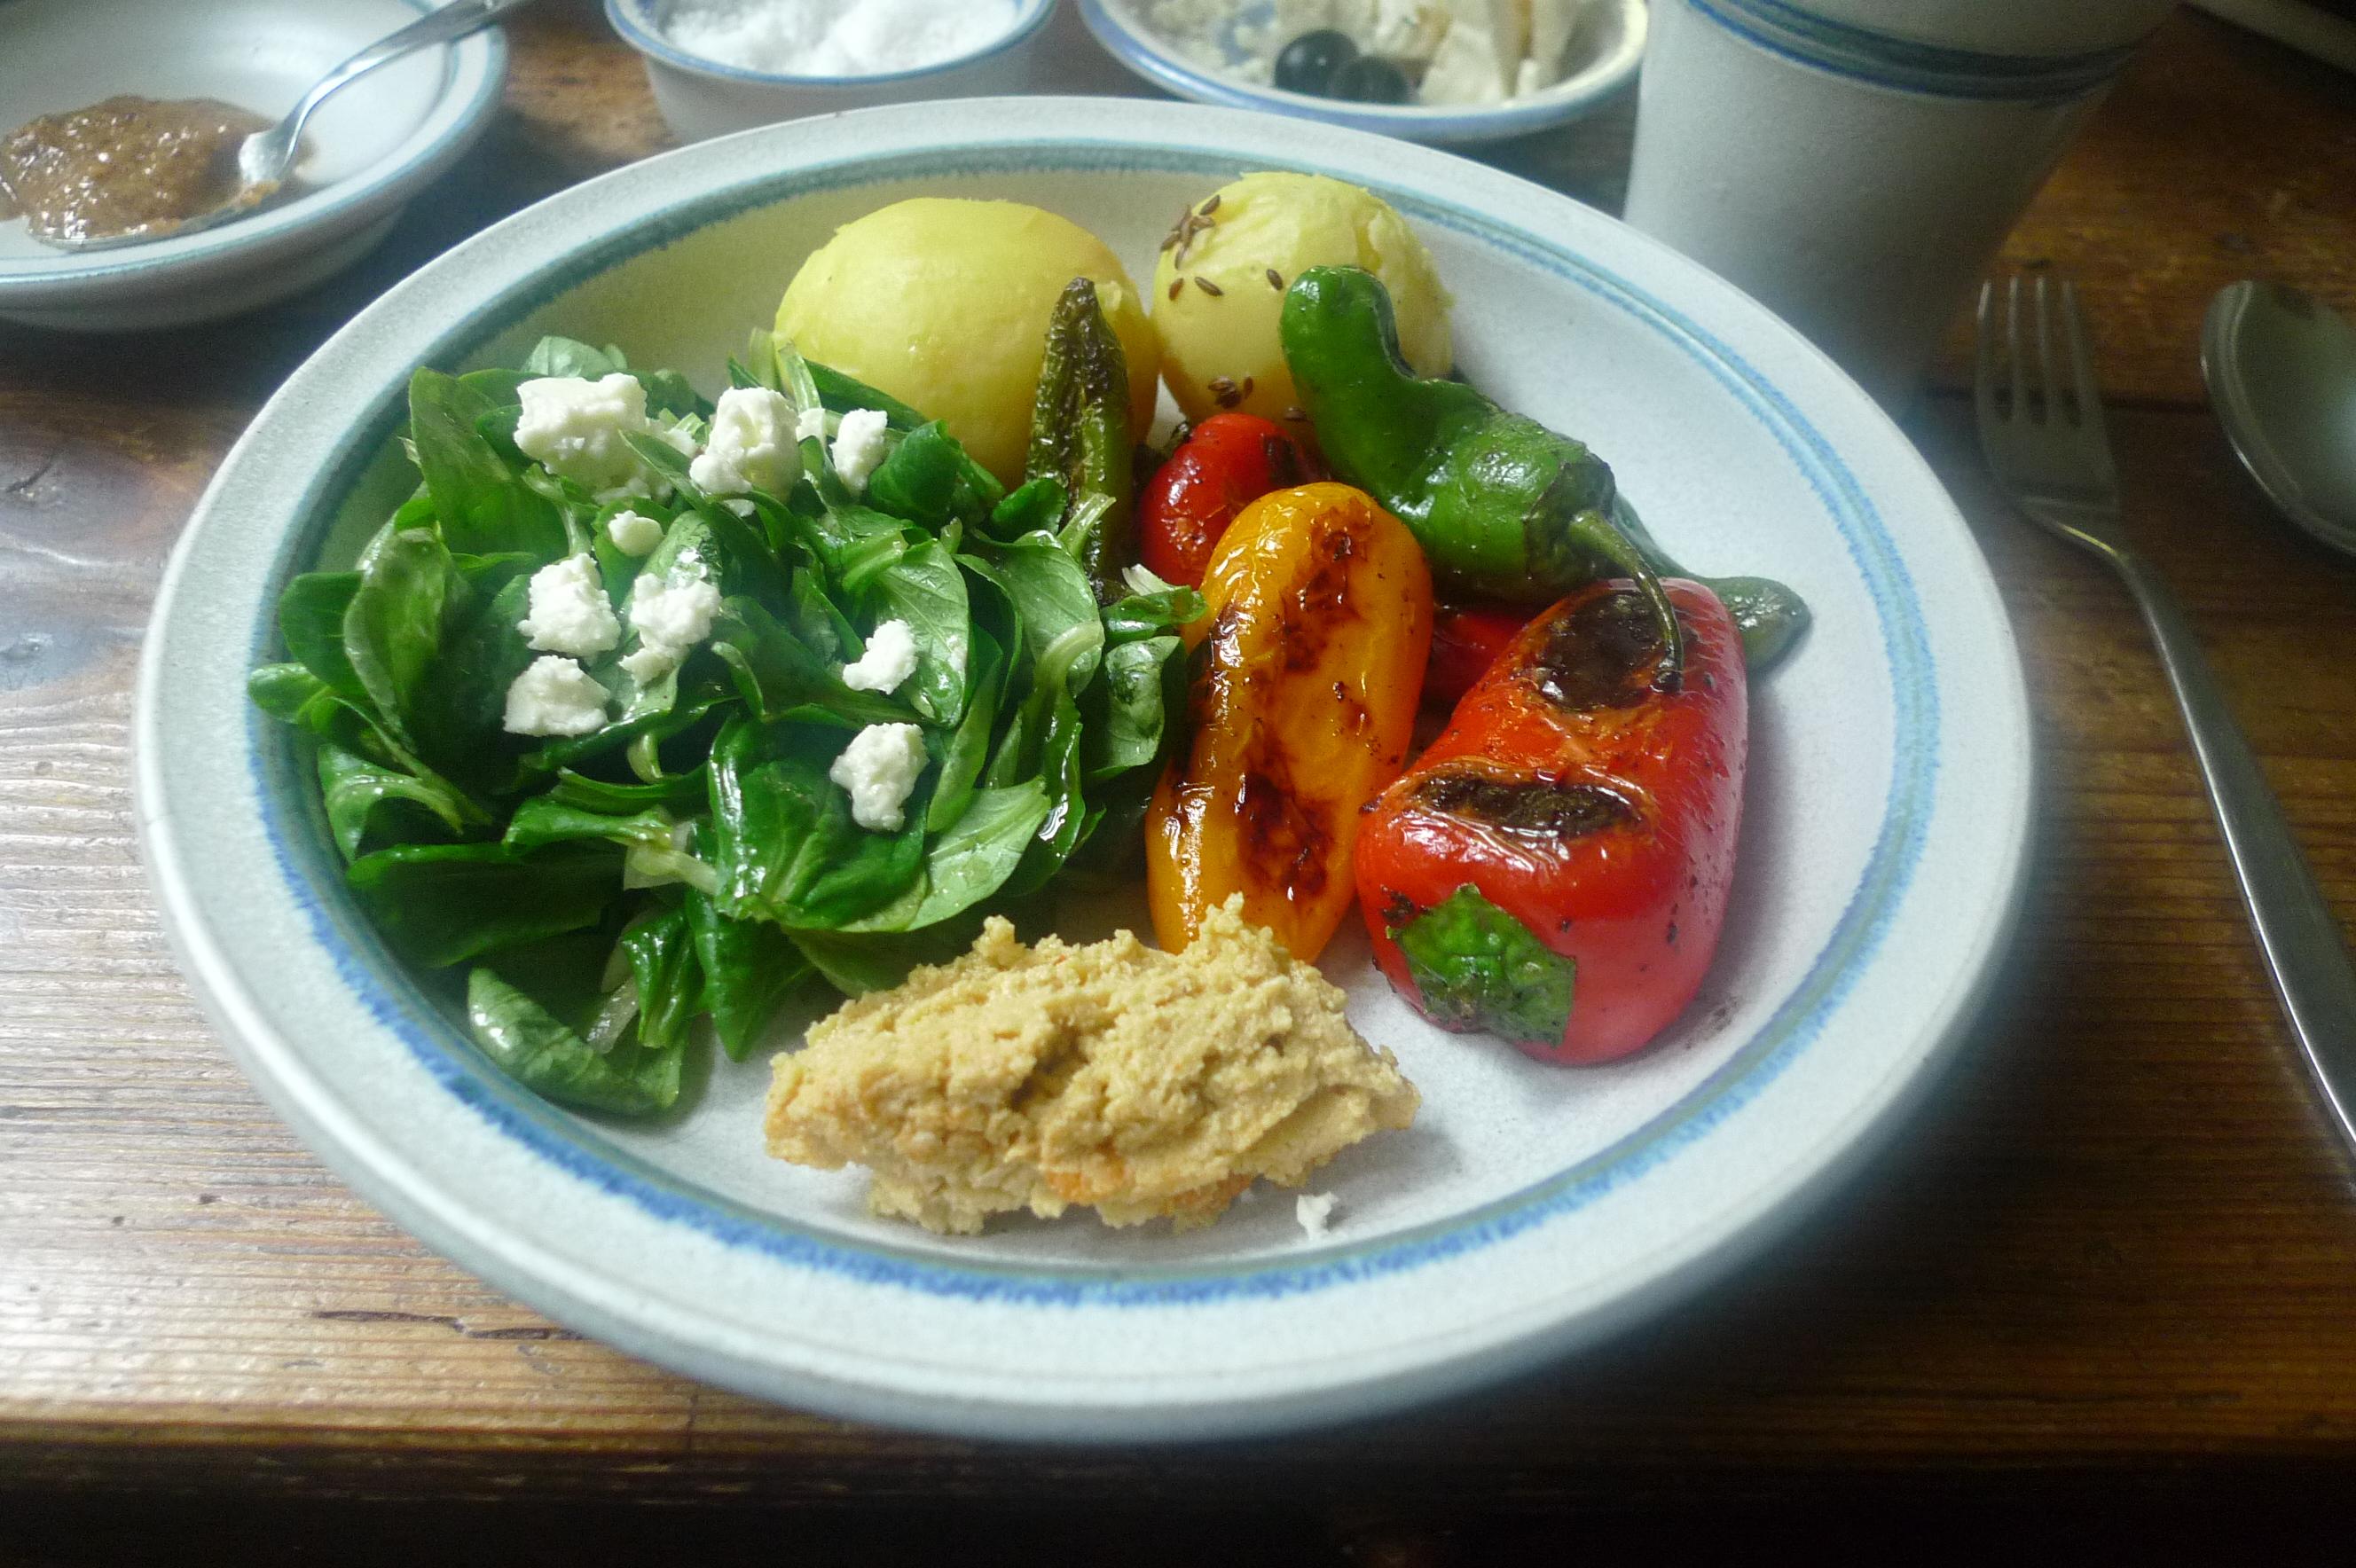 Pimentos-Paprika-Kartoffel-Salat-Buttermilch- 28.9.14   (13)